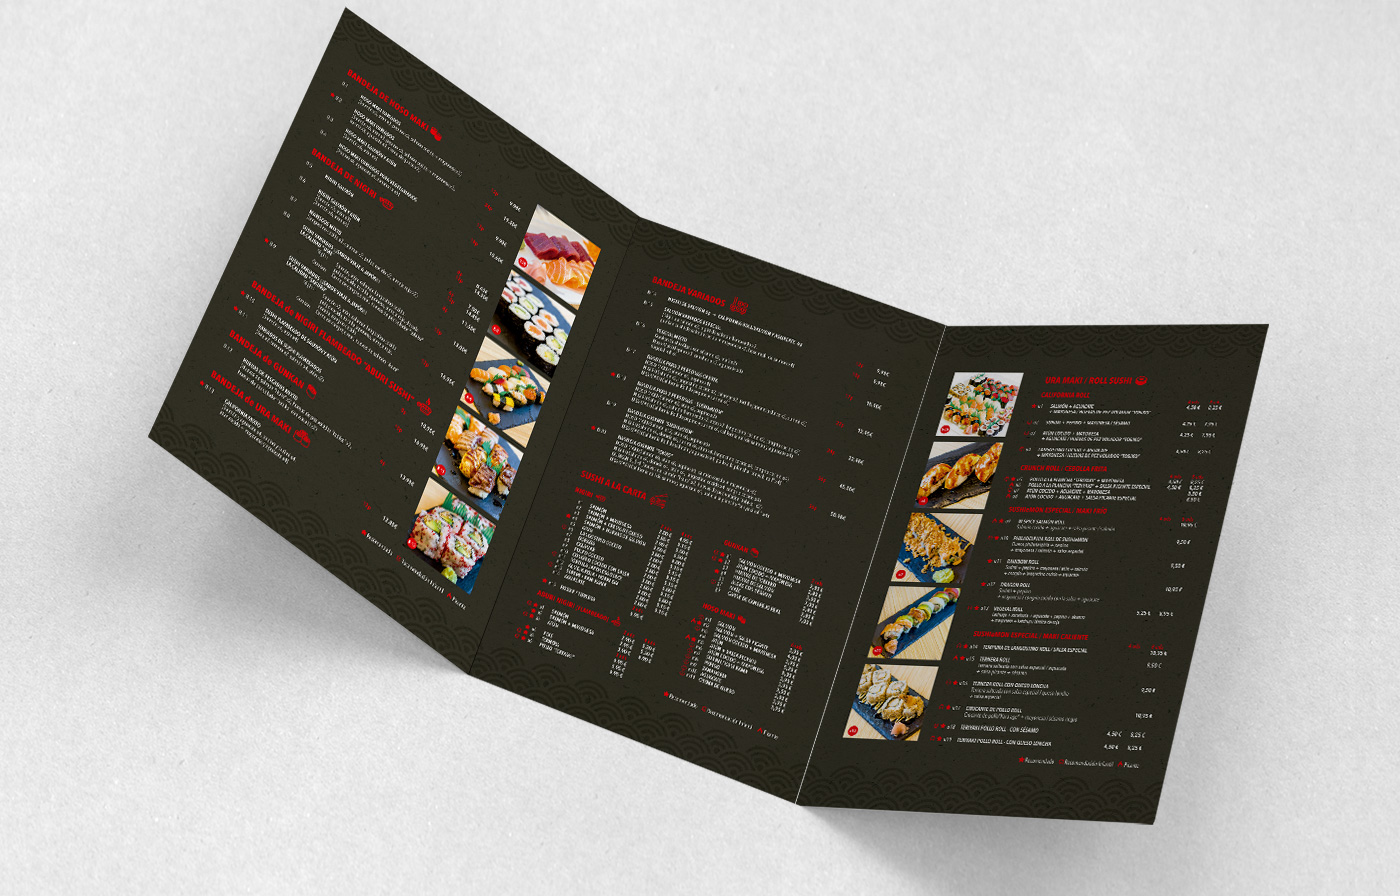 Sushi e Mon - Menú design